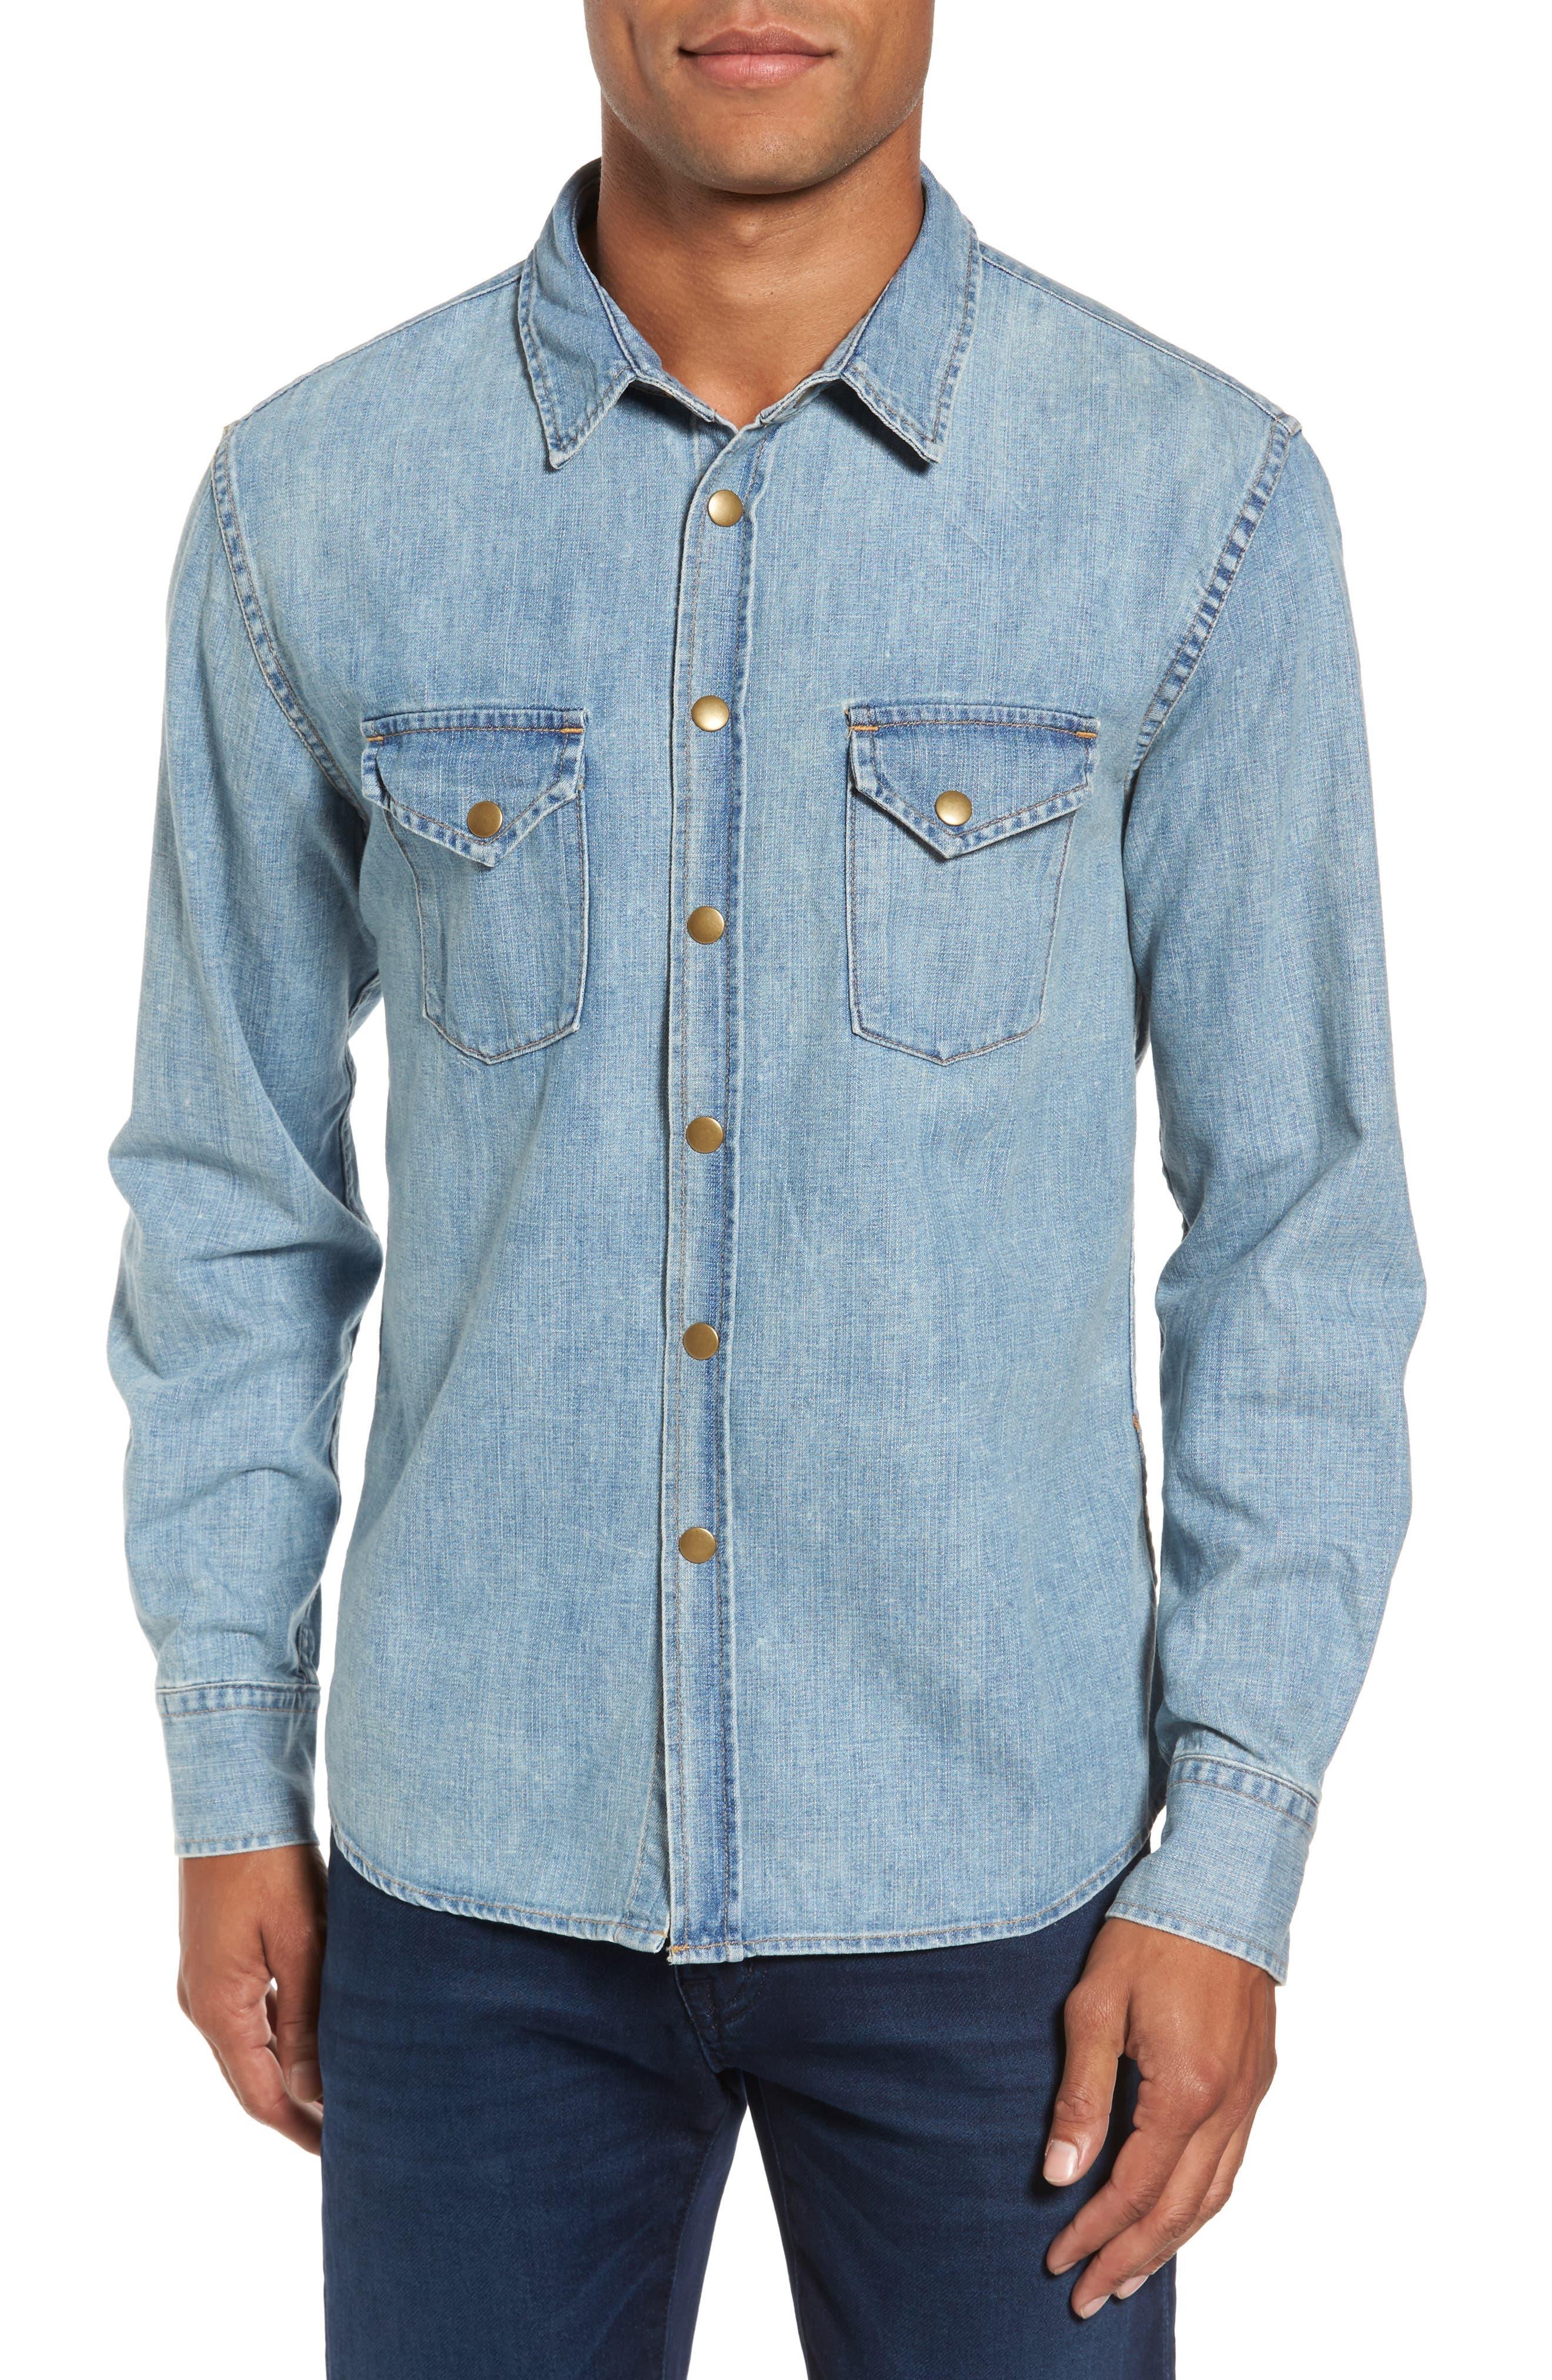 Main Image - Billy Reid Distressed Denim Western Shirt